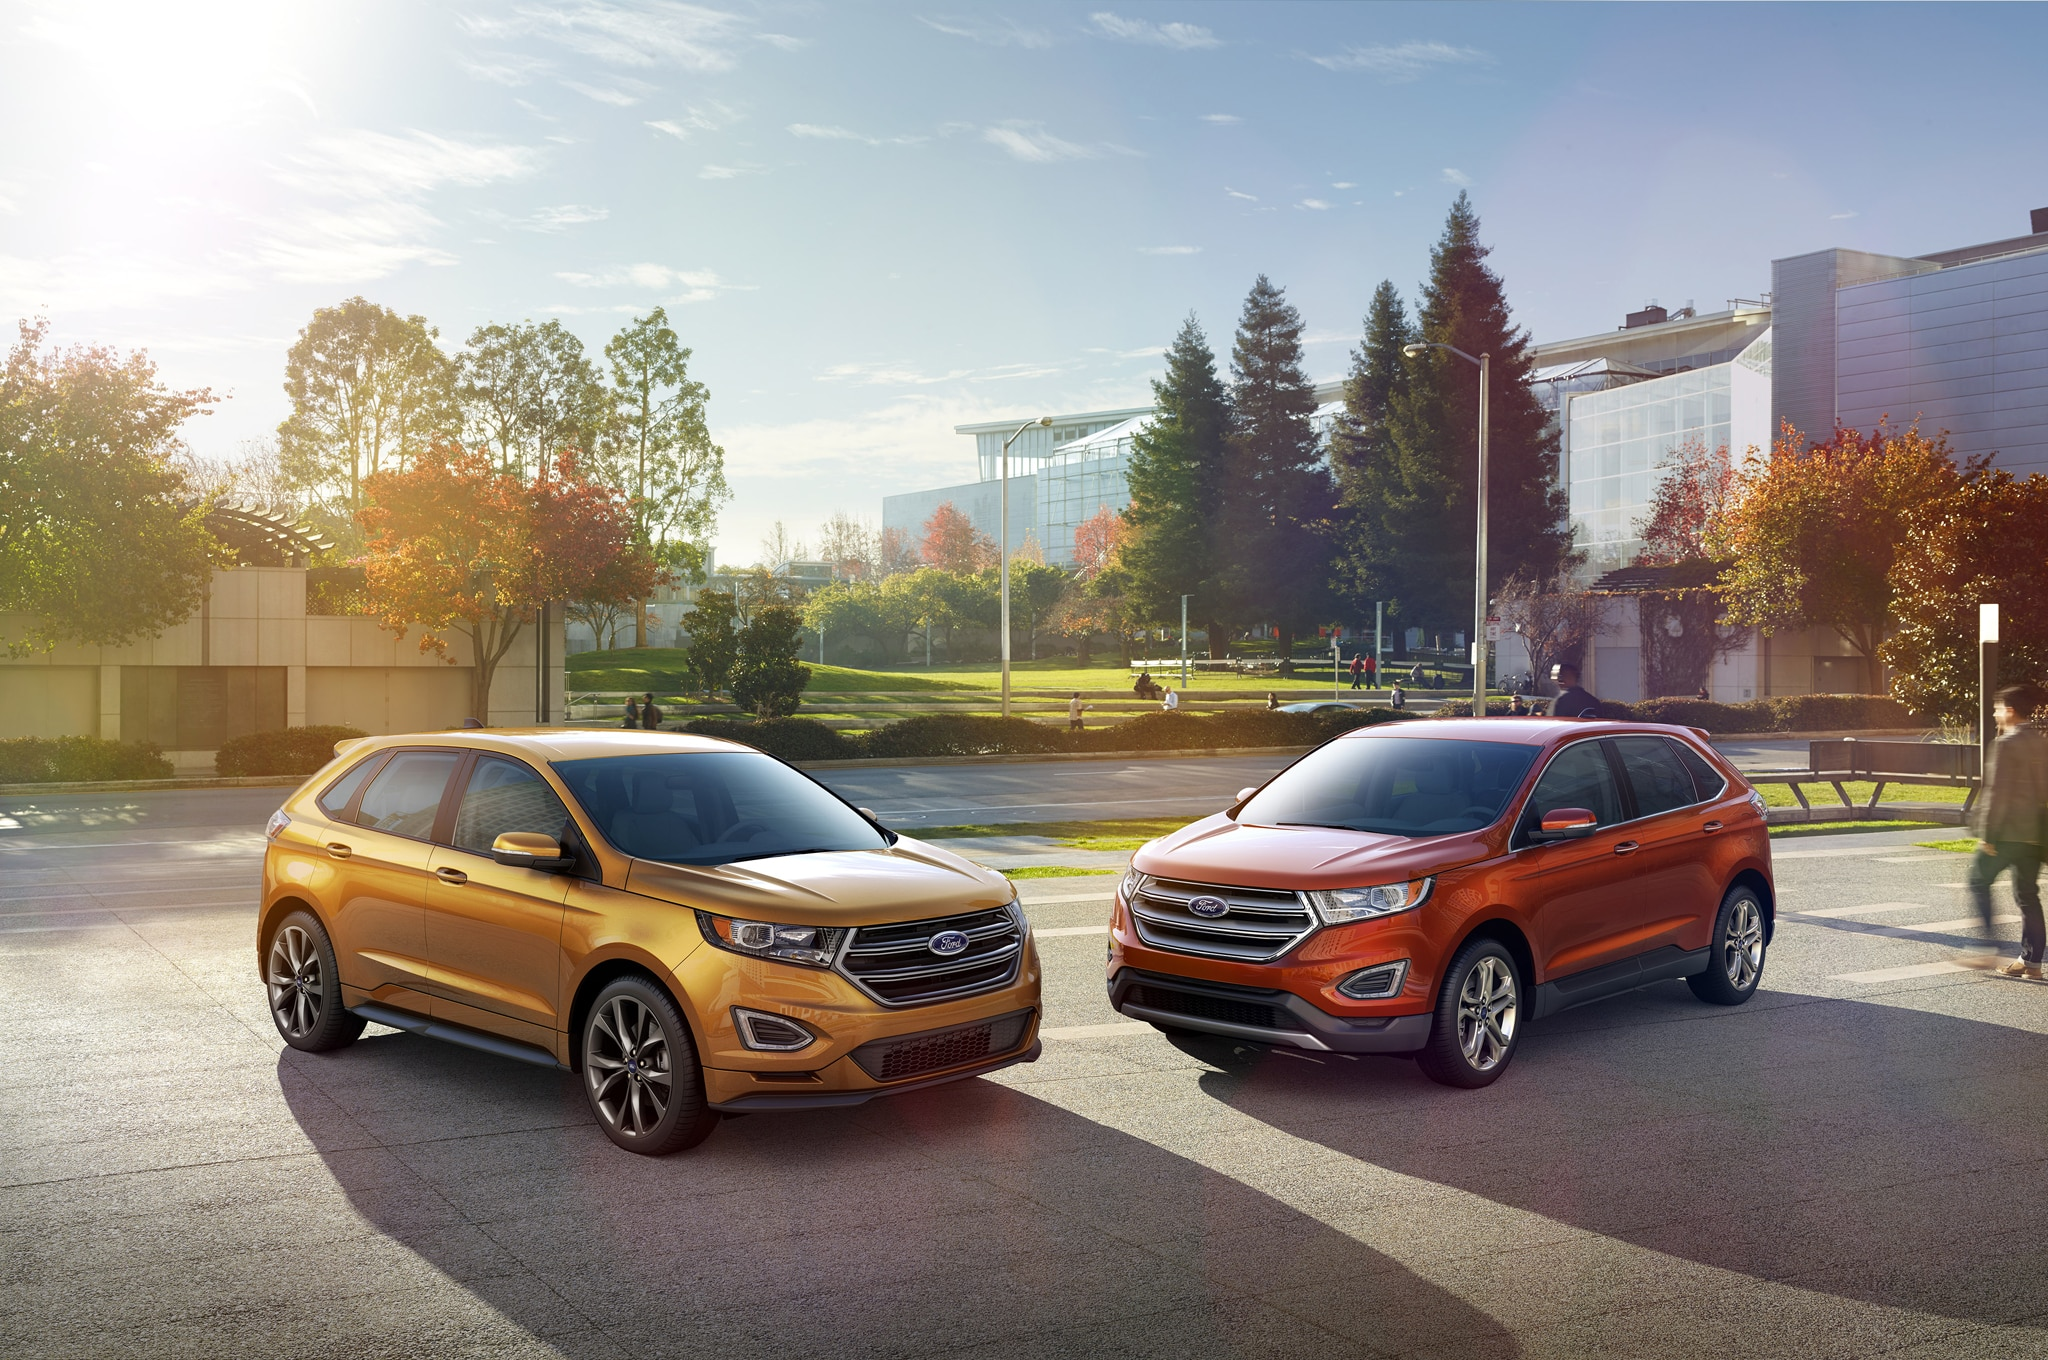 2015 Ford Edge Front Three Quarter